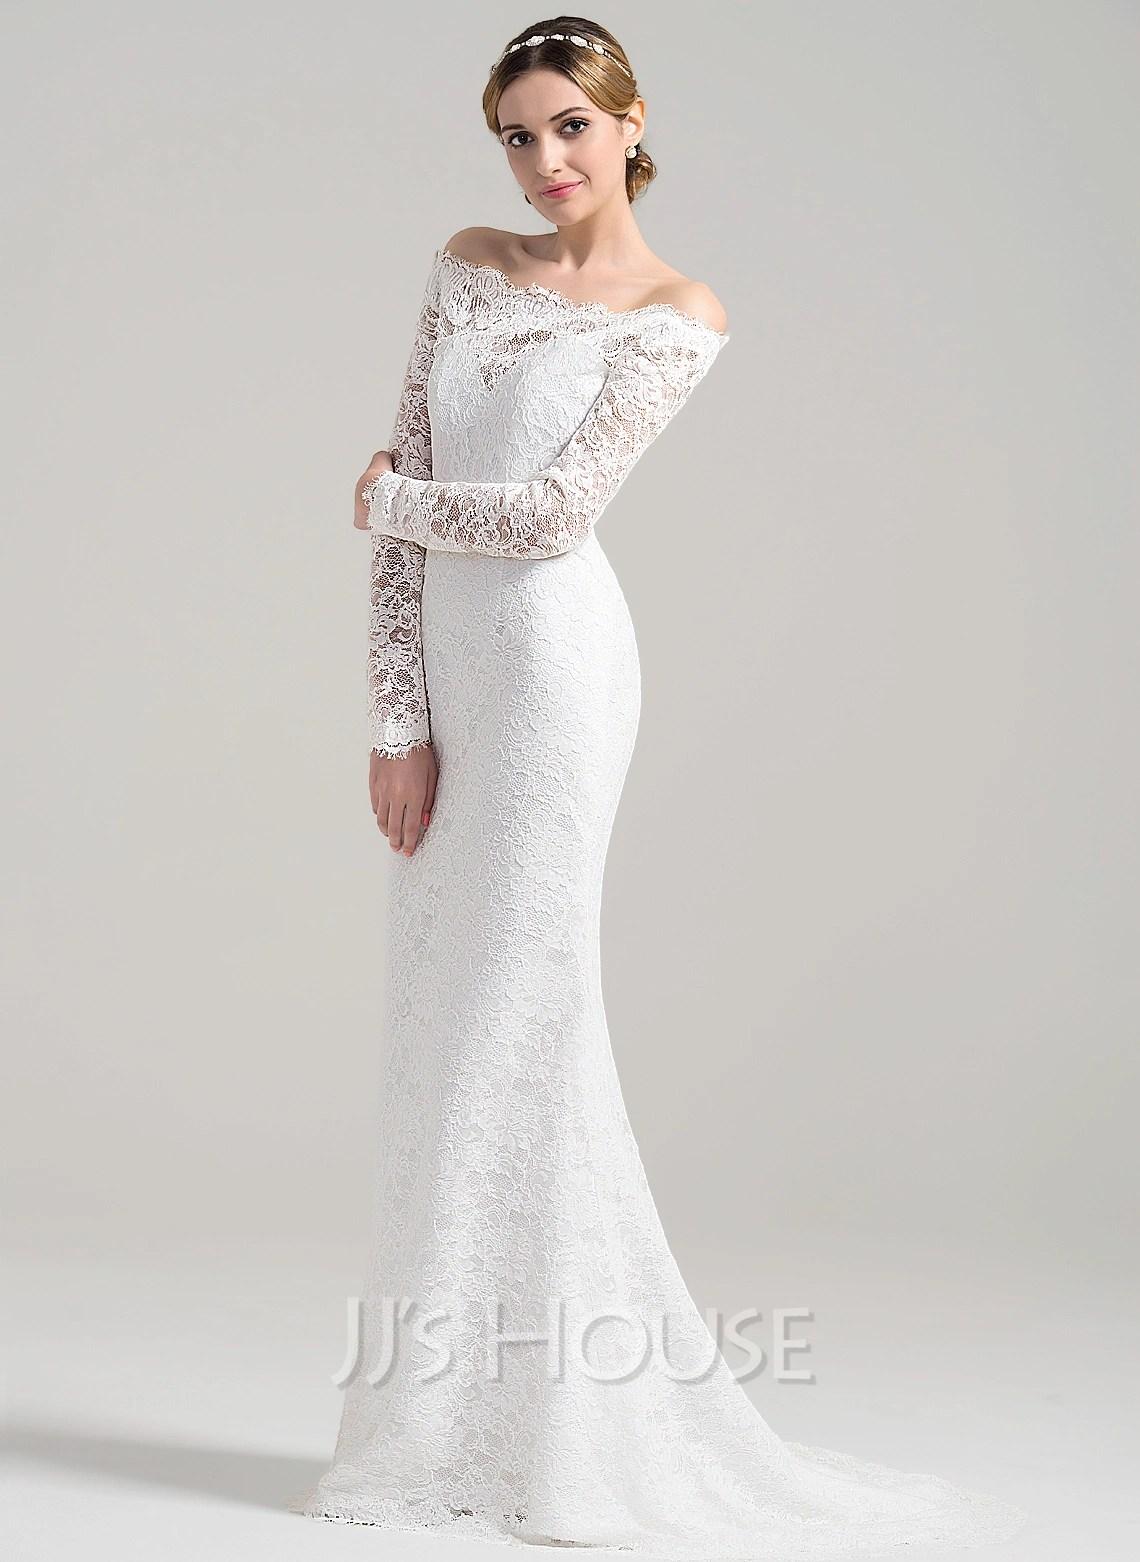 Beach p cheapest wedding dresses Sheath Column Off the Shoulder Sweep Train Lace Wedding Dress